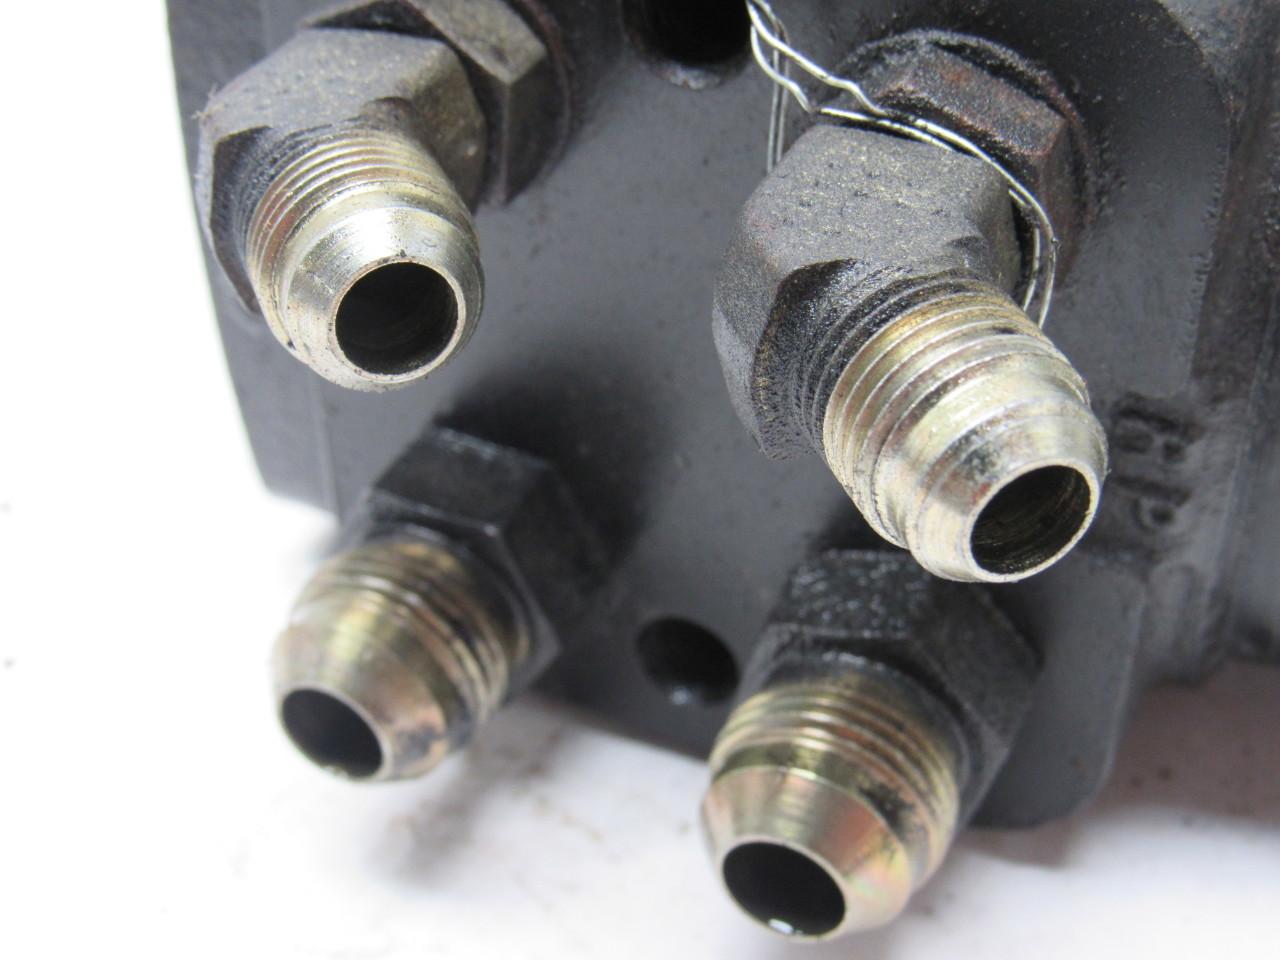 Trailer Axle Likewise Wiring Diagram Old Telephone Wiring Diagram